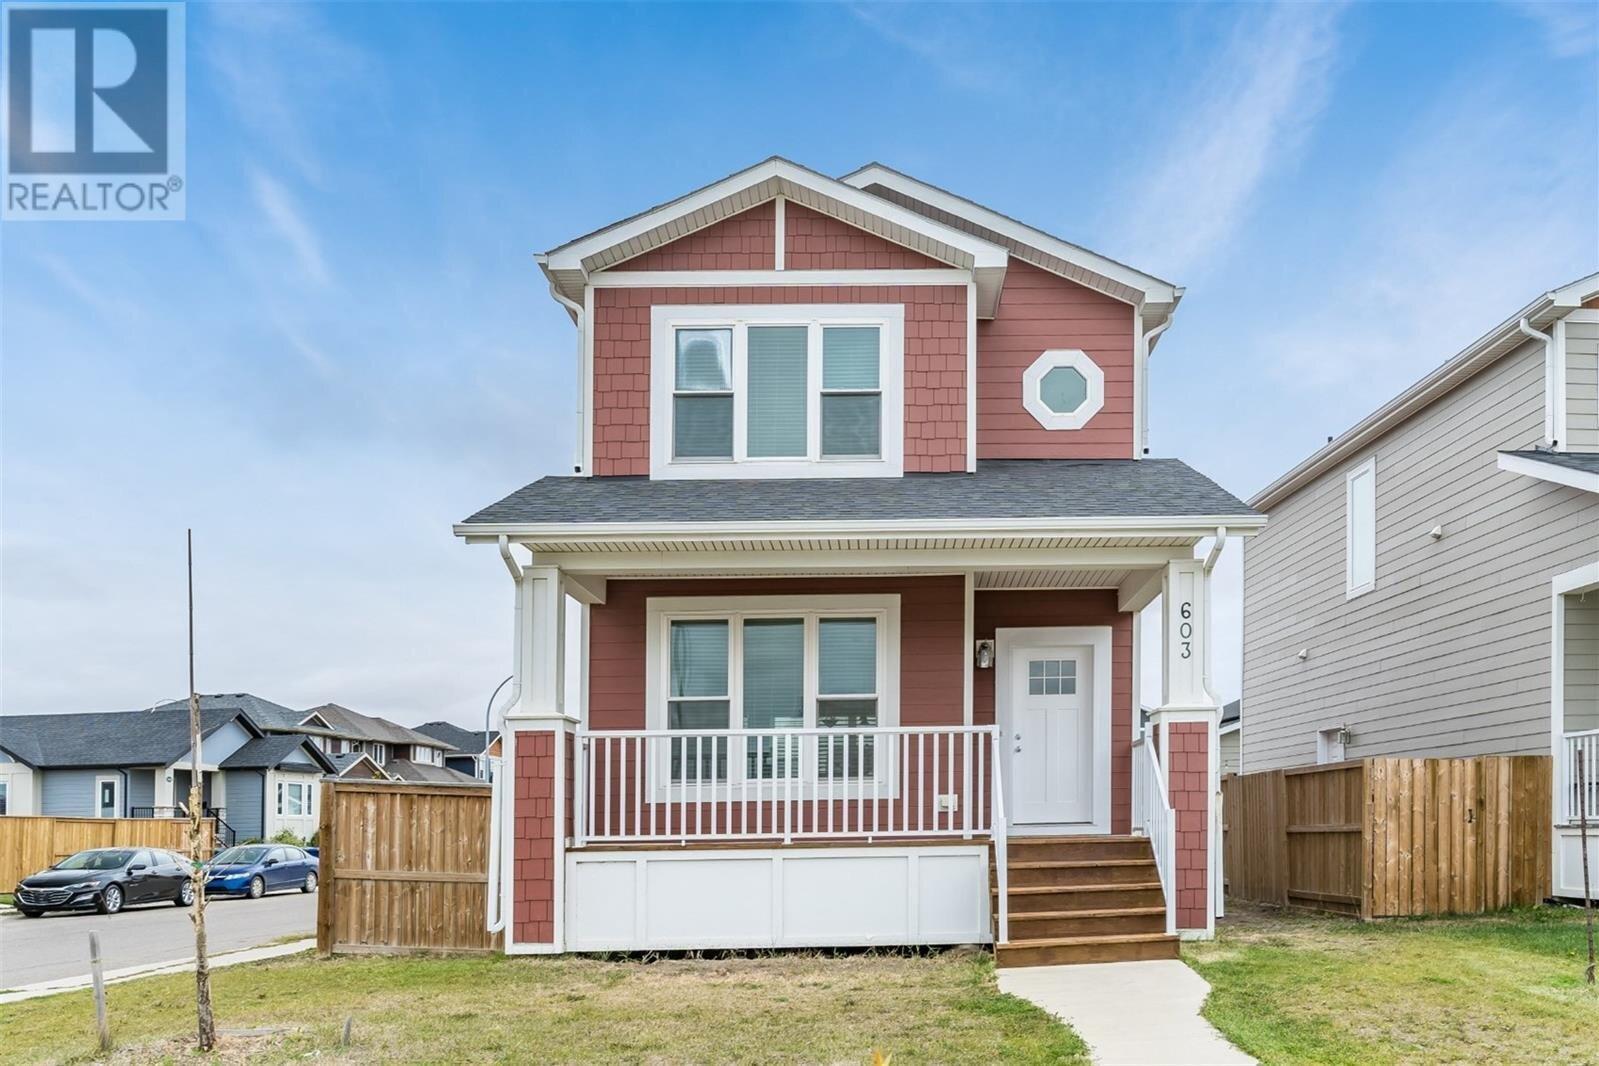 House for sale at 603 Meadows Blvd Saskatoon Saskatchewan - MLS: SK831262